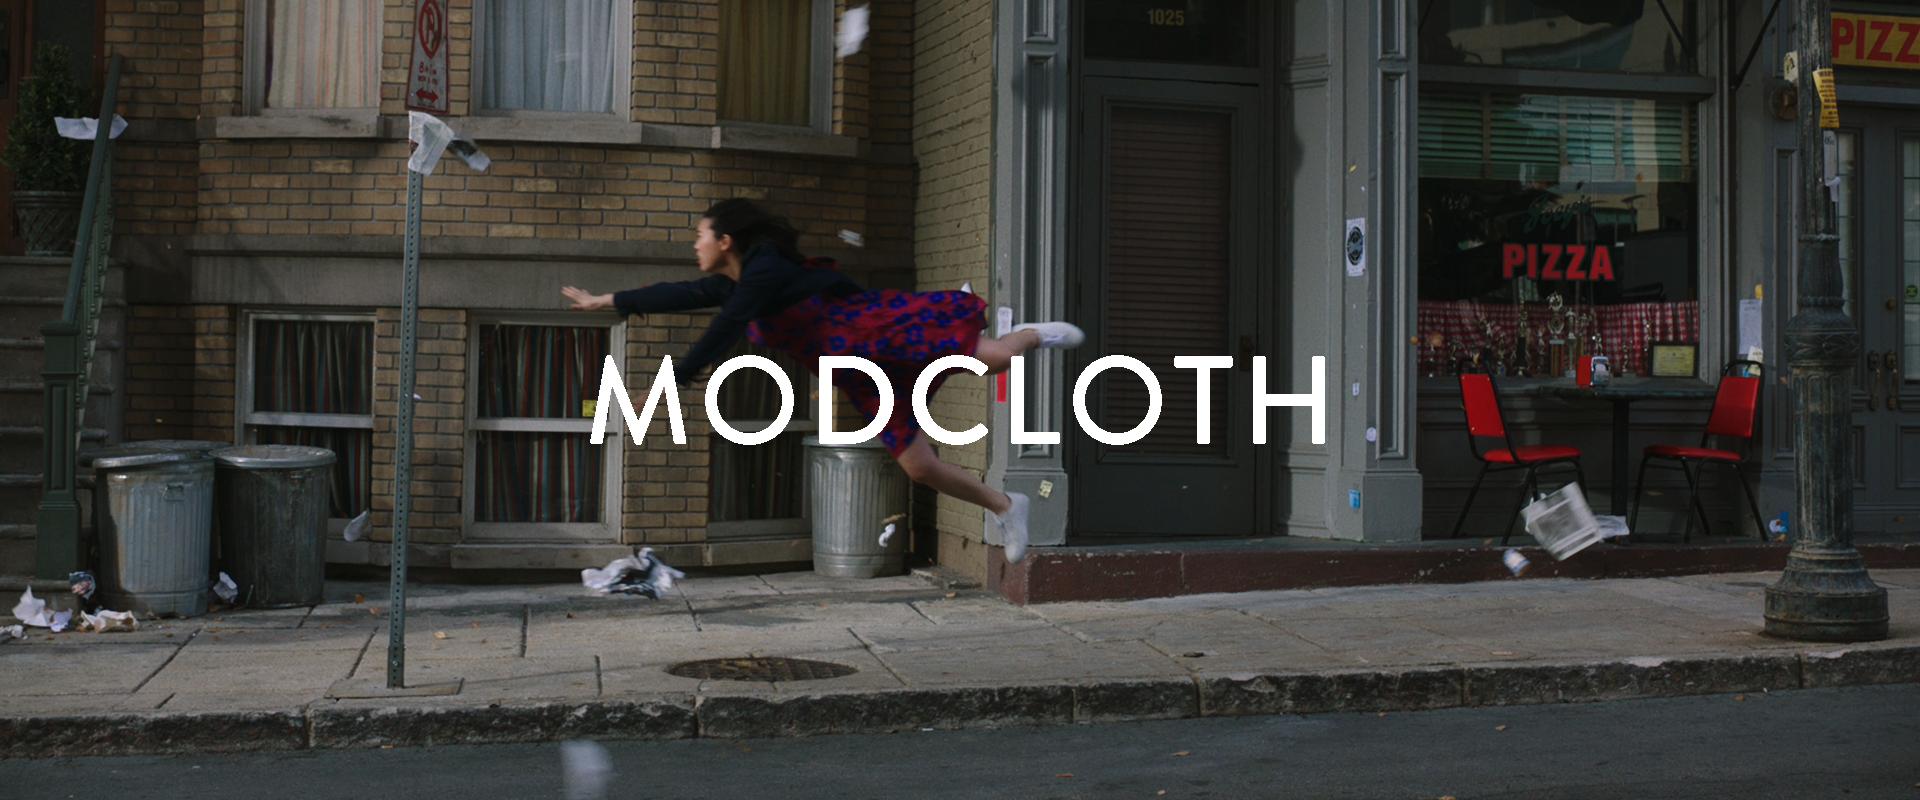 Modcloth.png